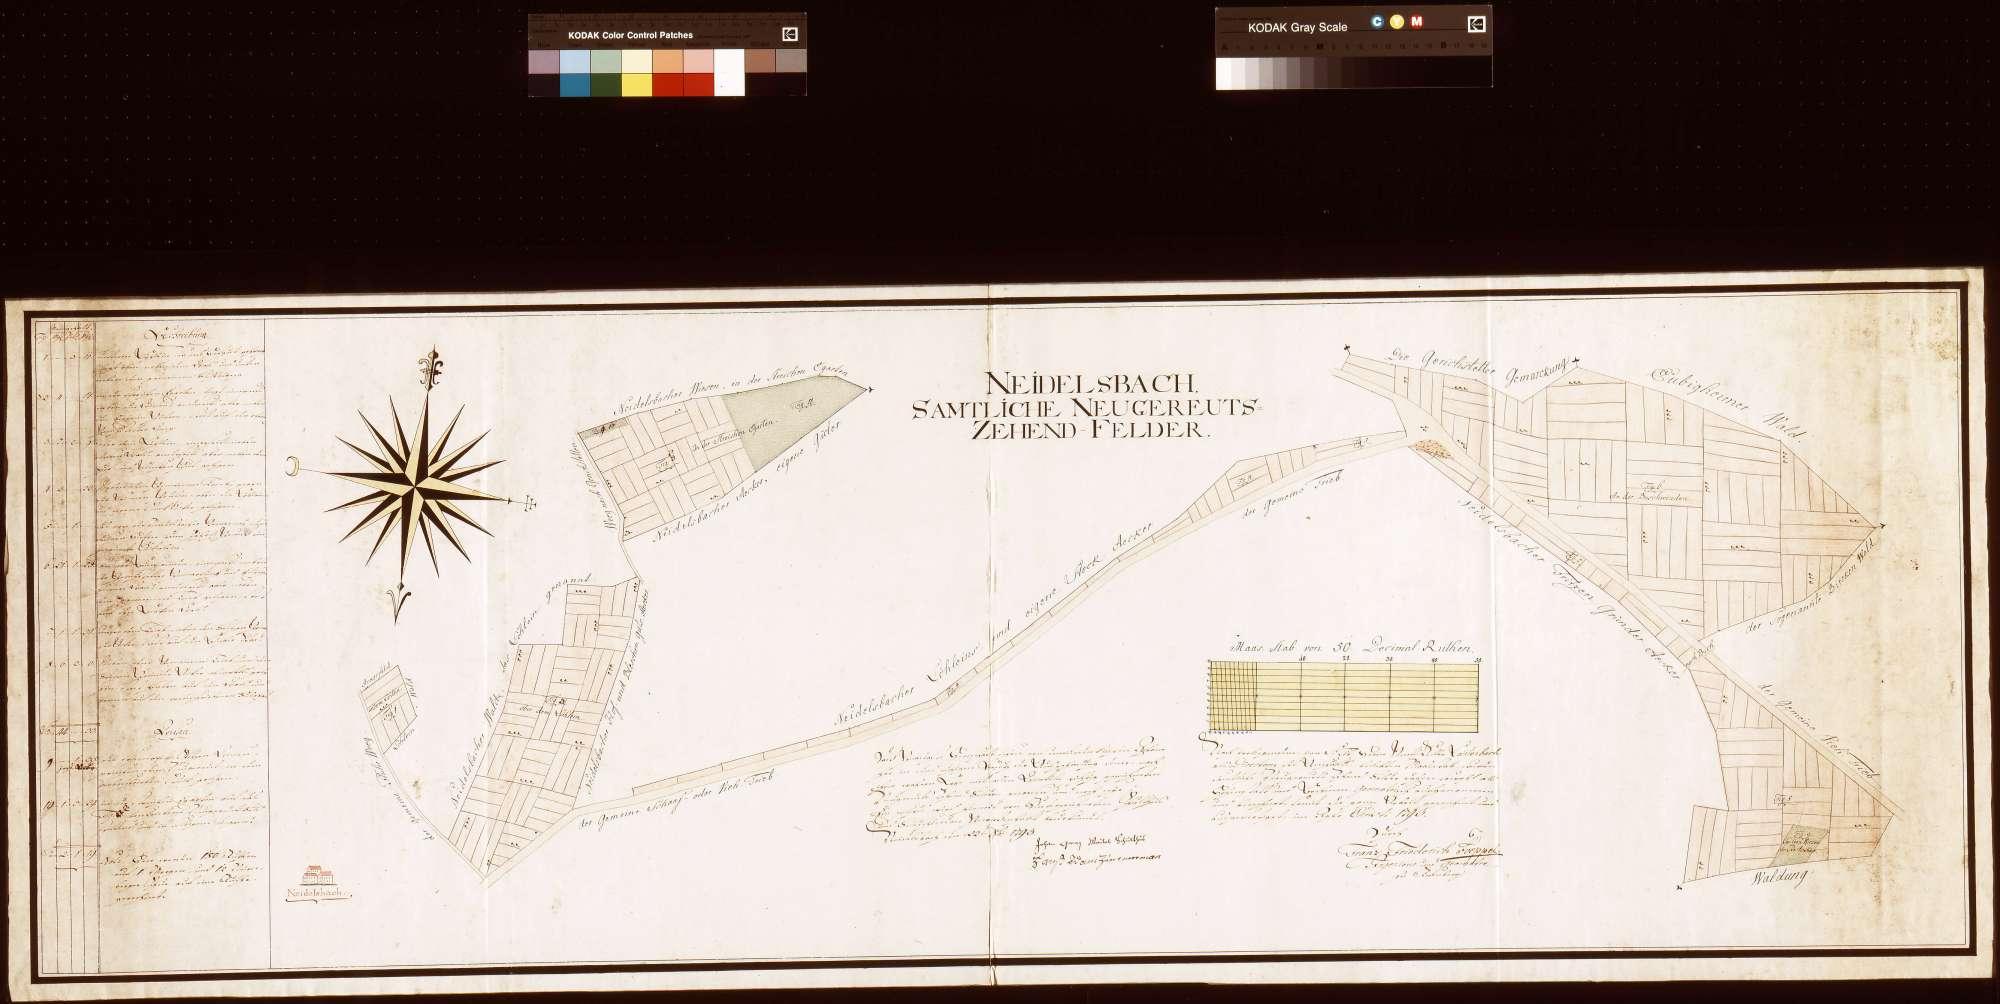 Neidelsbach: Sämtliche Neugereutszehntfelder (Inselkarte), Bild 1